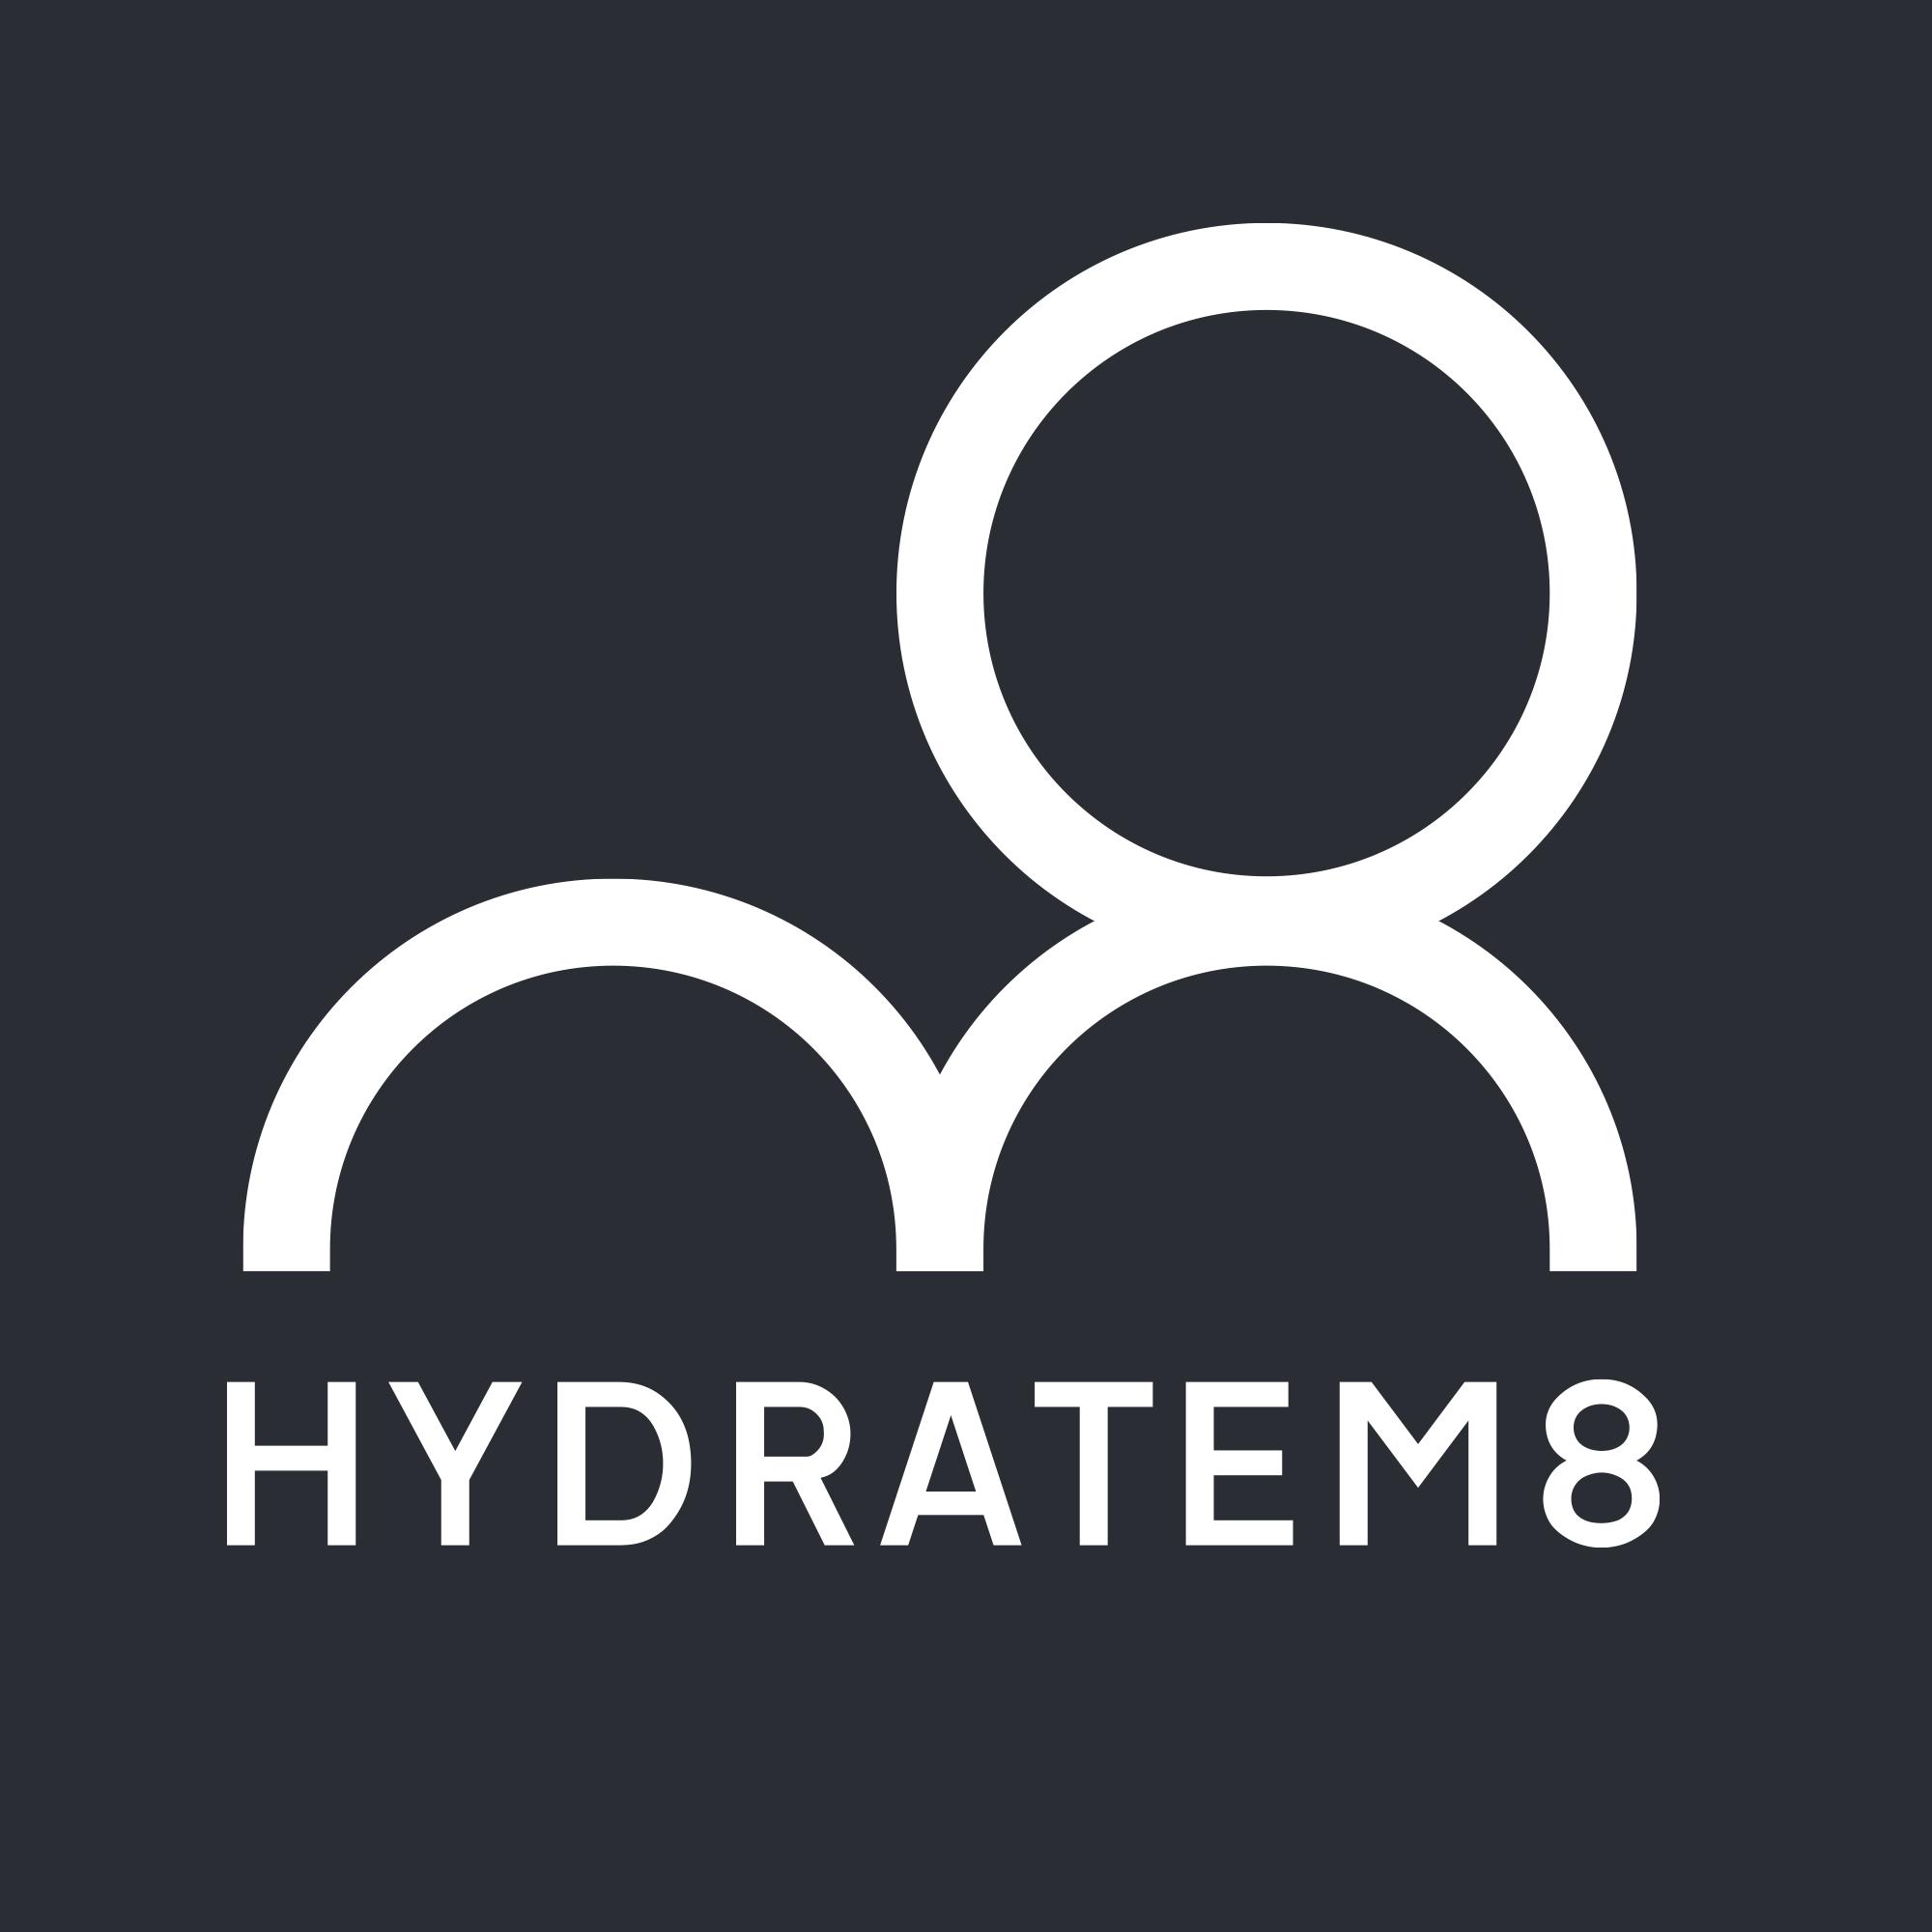 Read HydrateM8 Reviews